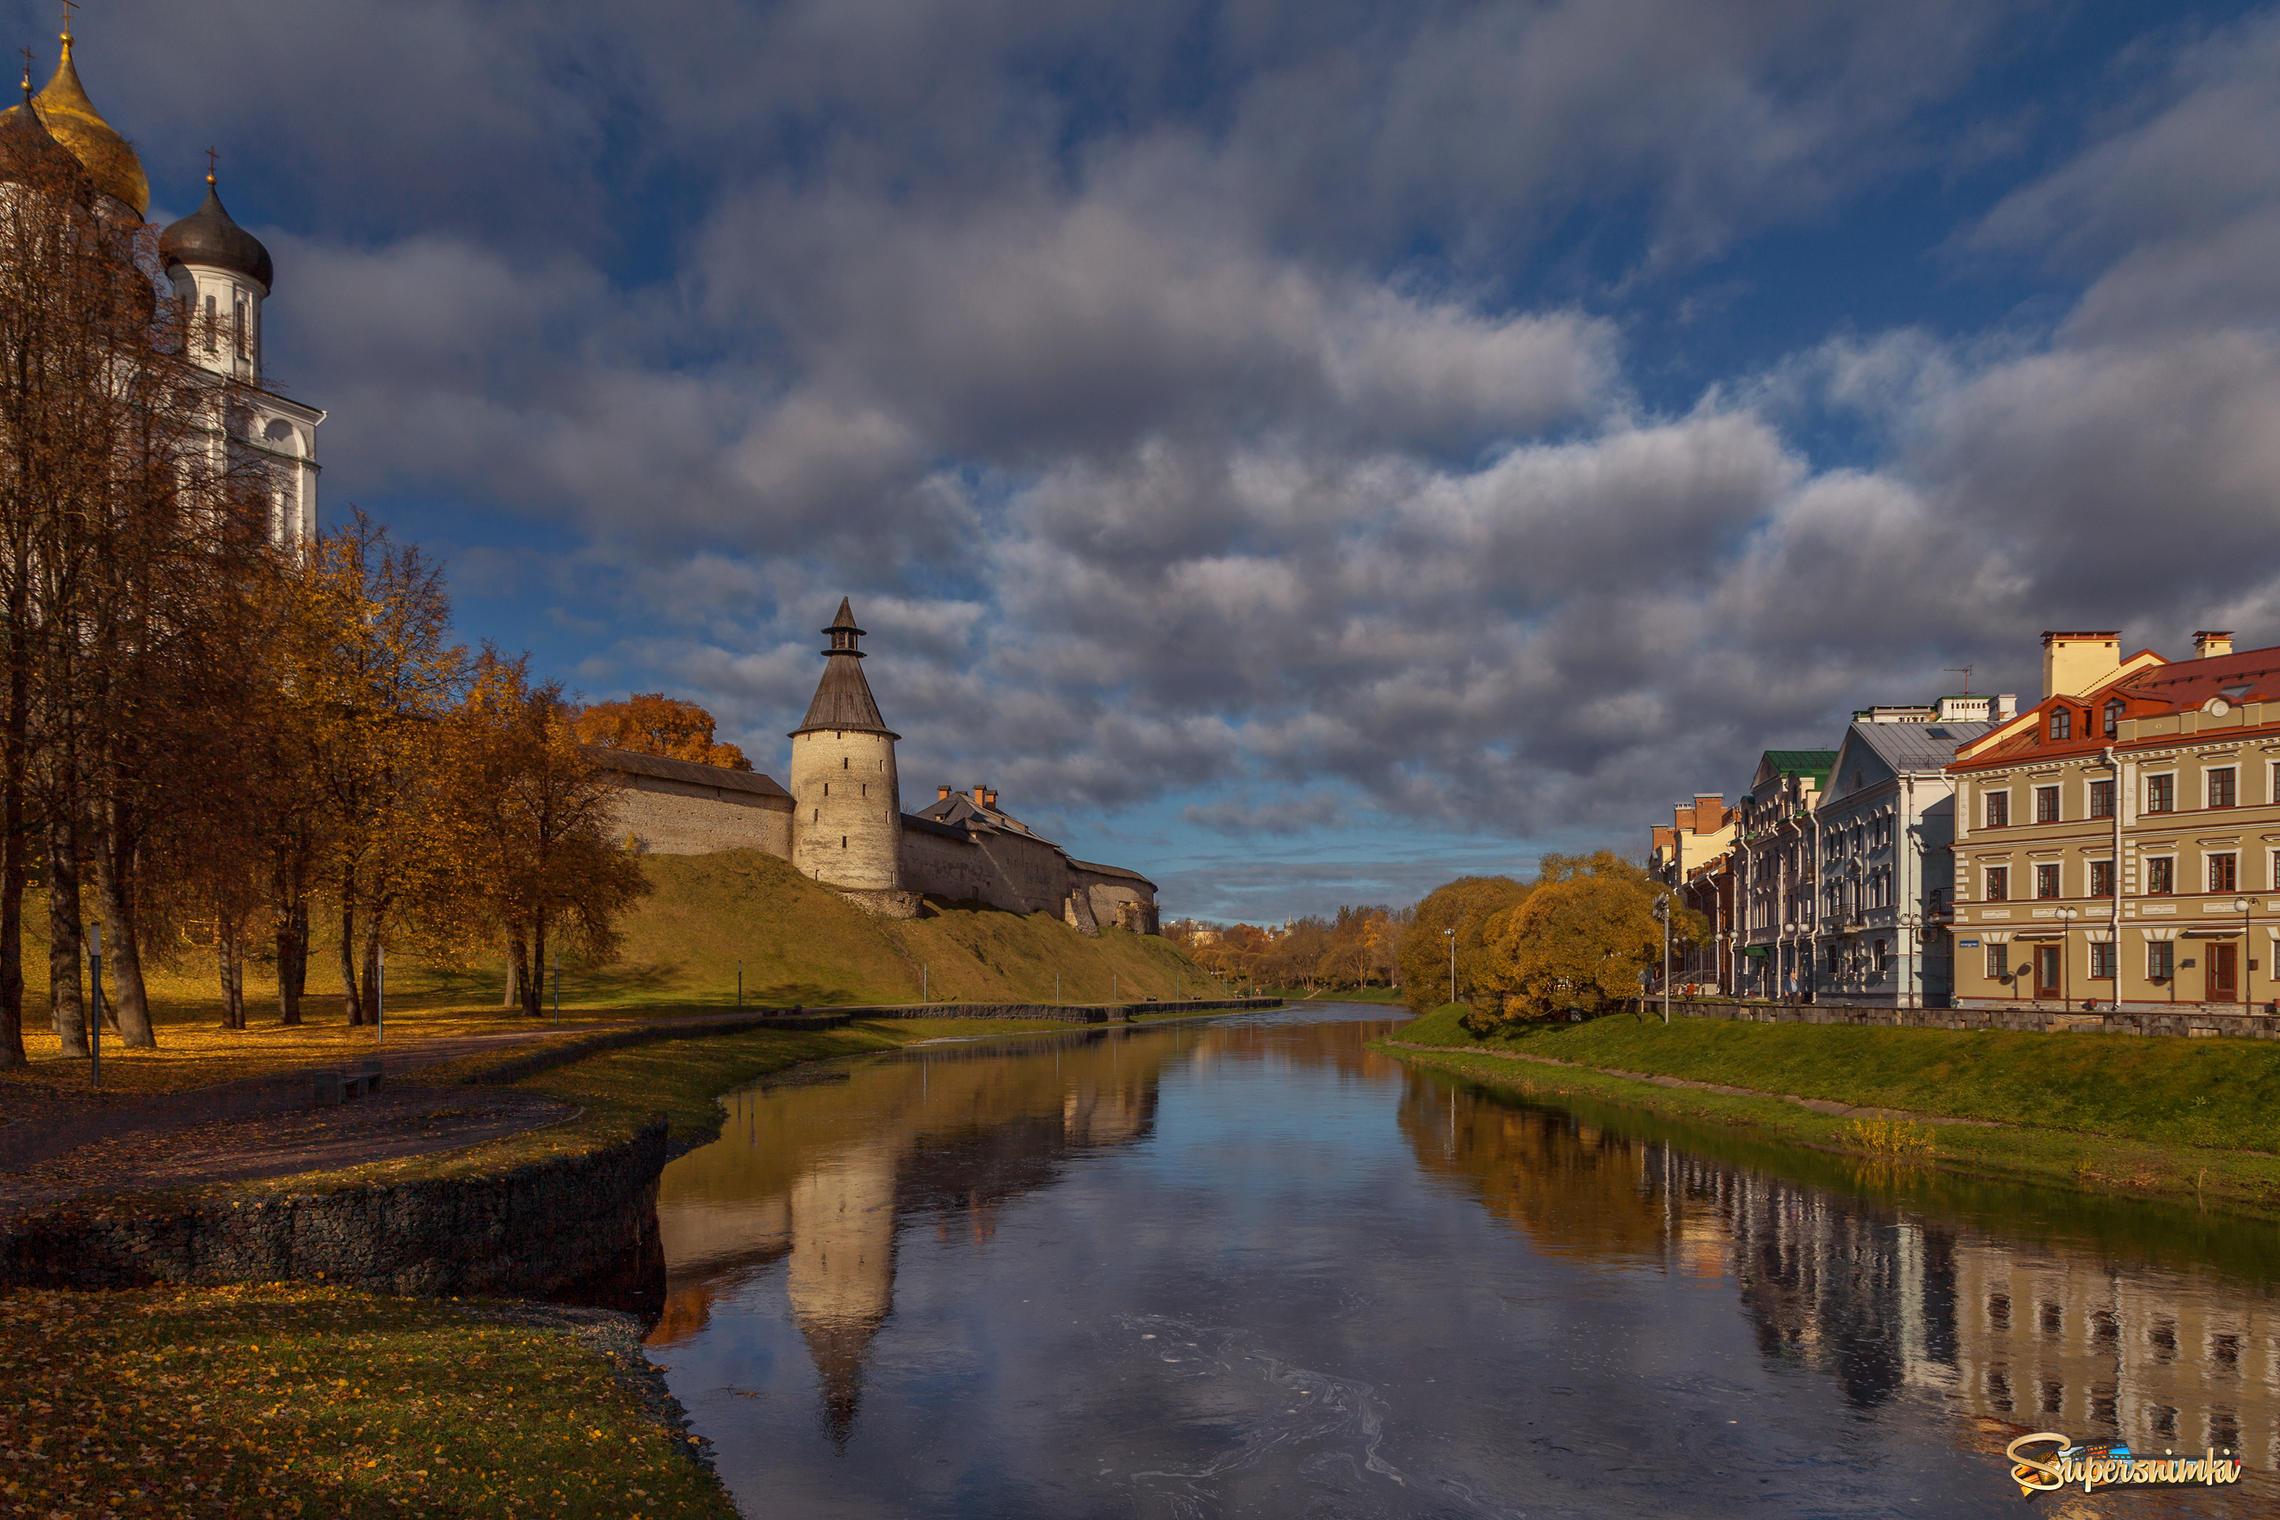 Осень в городе...   Фотосайт СуперСнимки.Ру